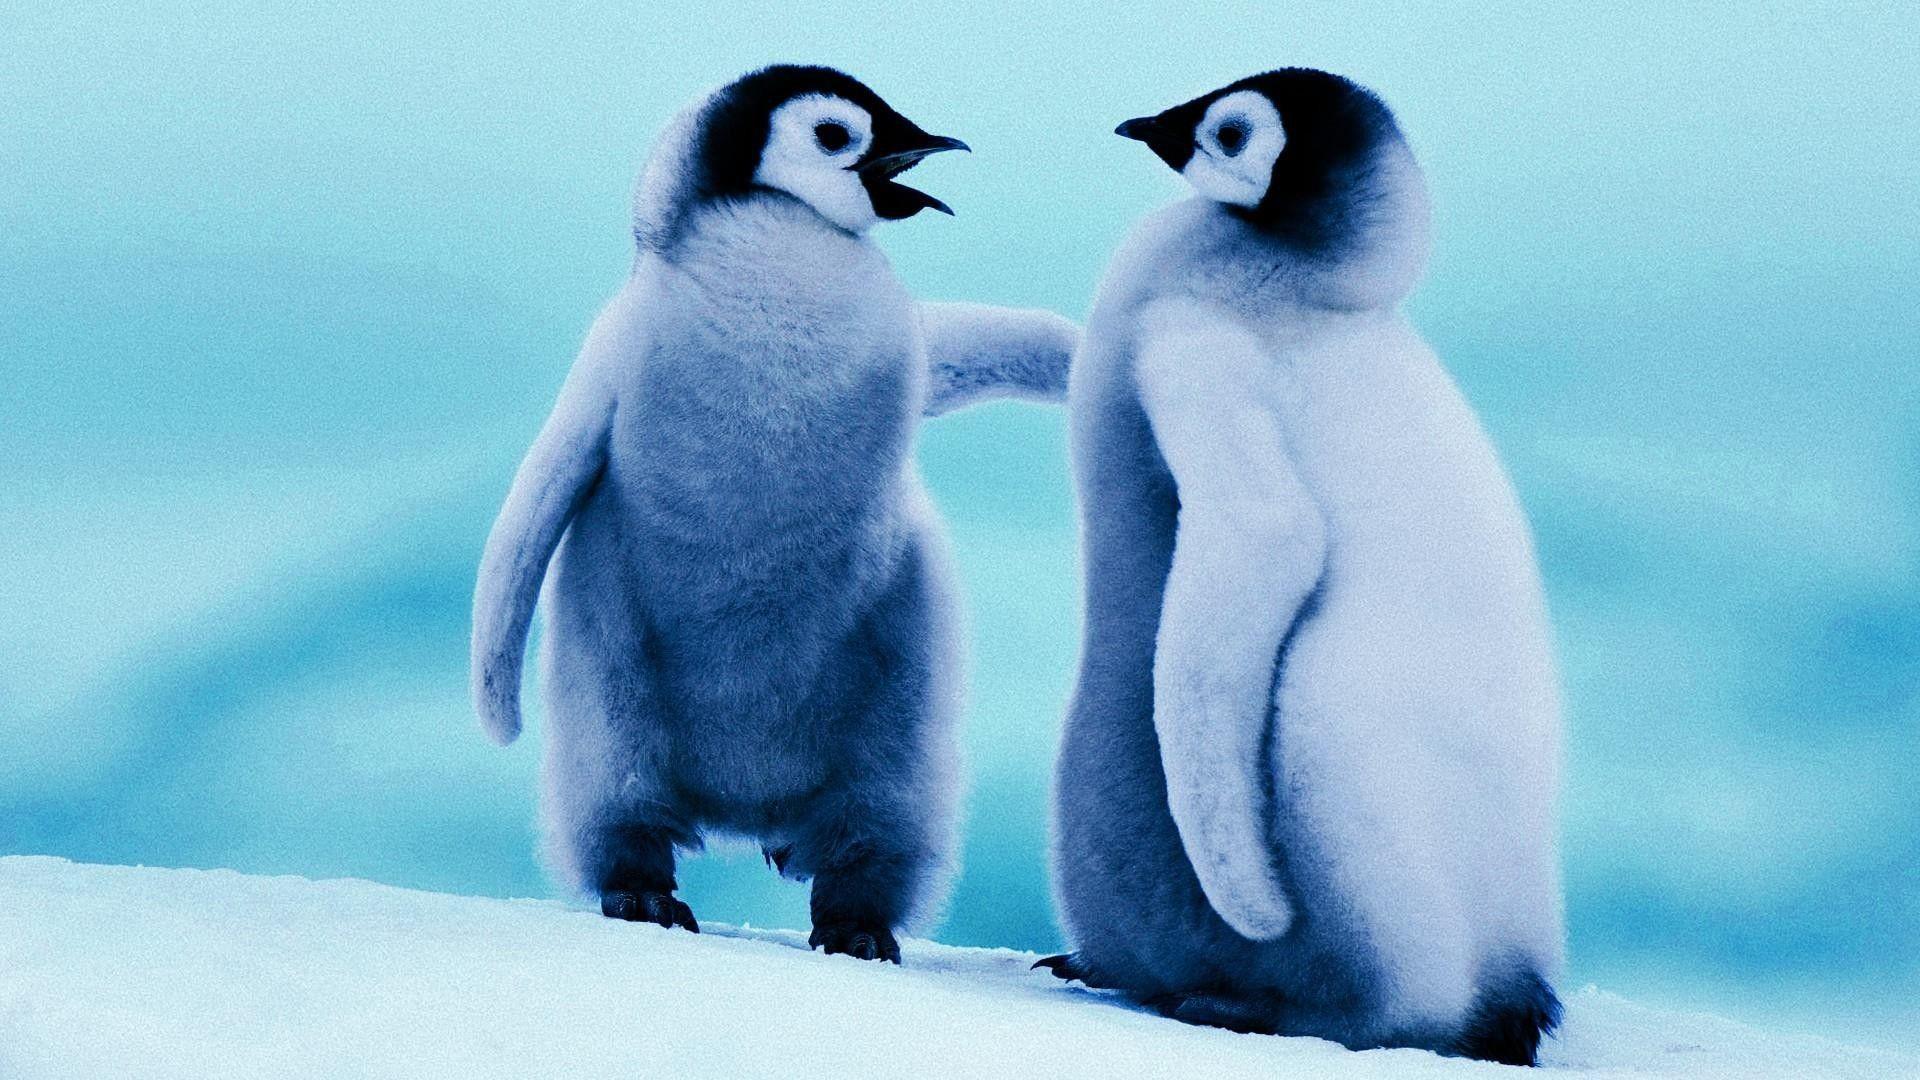 penguin images free download